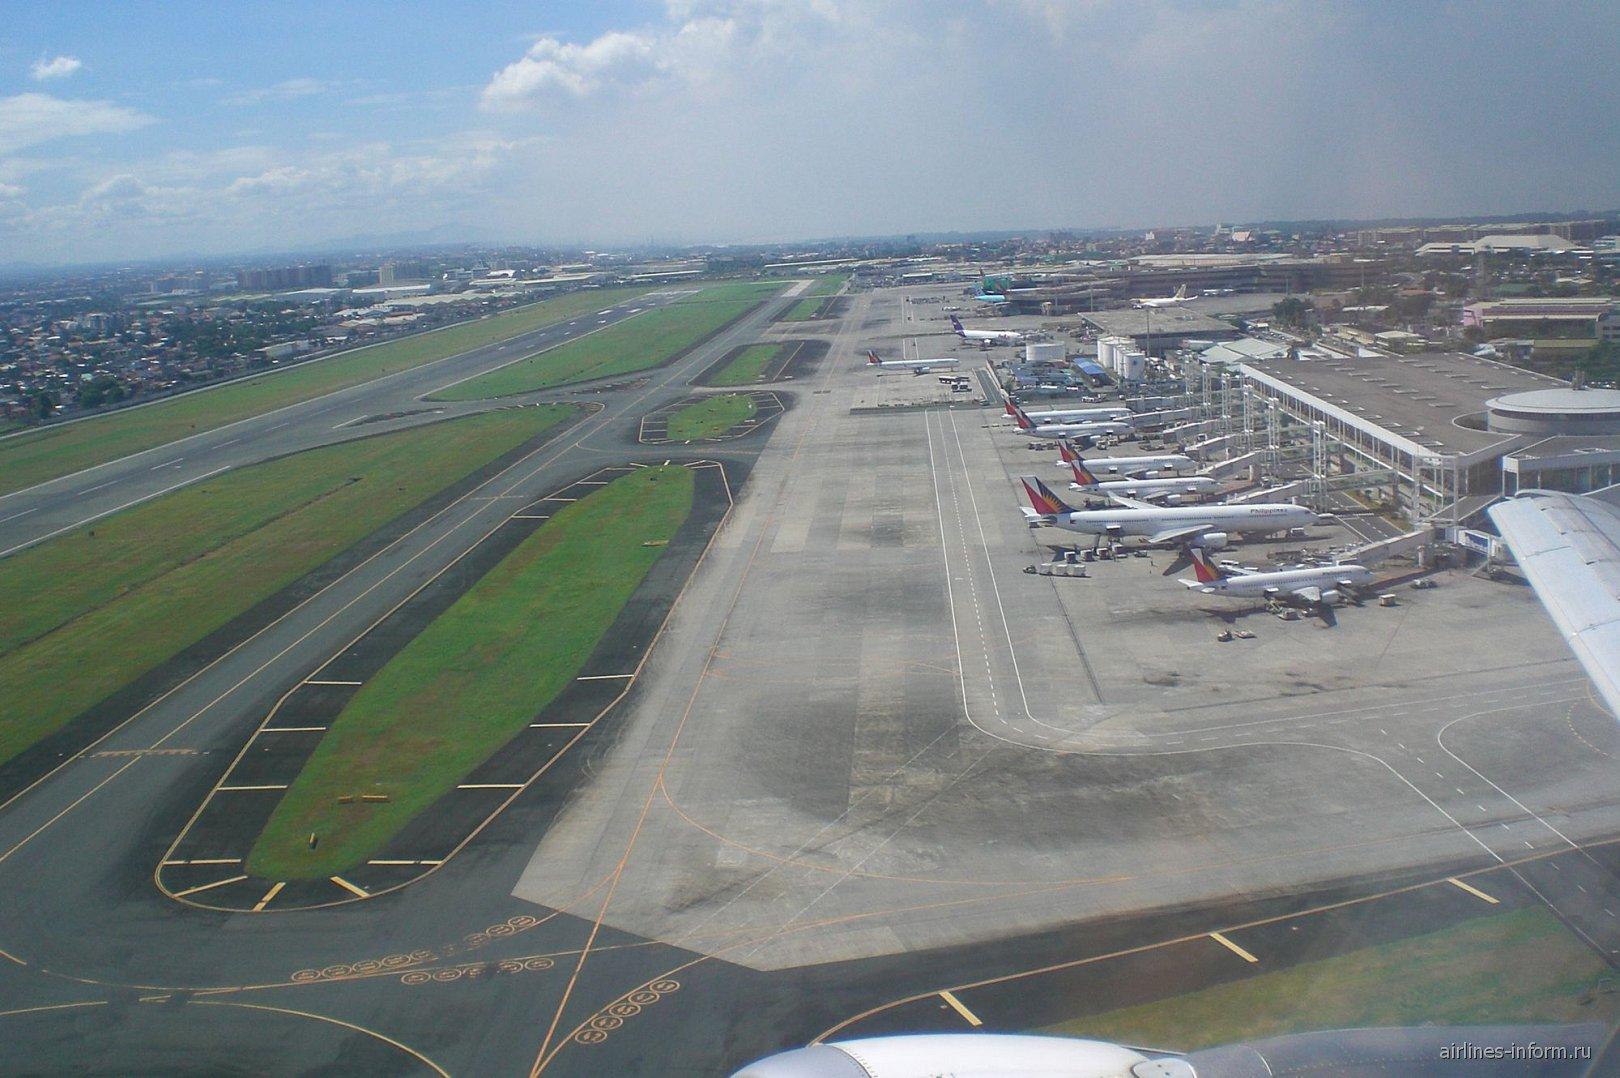 Аэропорт Манила имени Никой Акуино